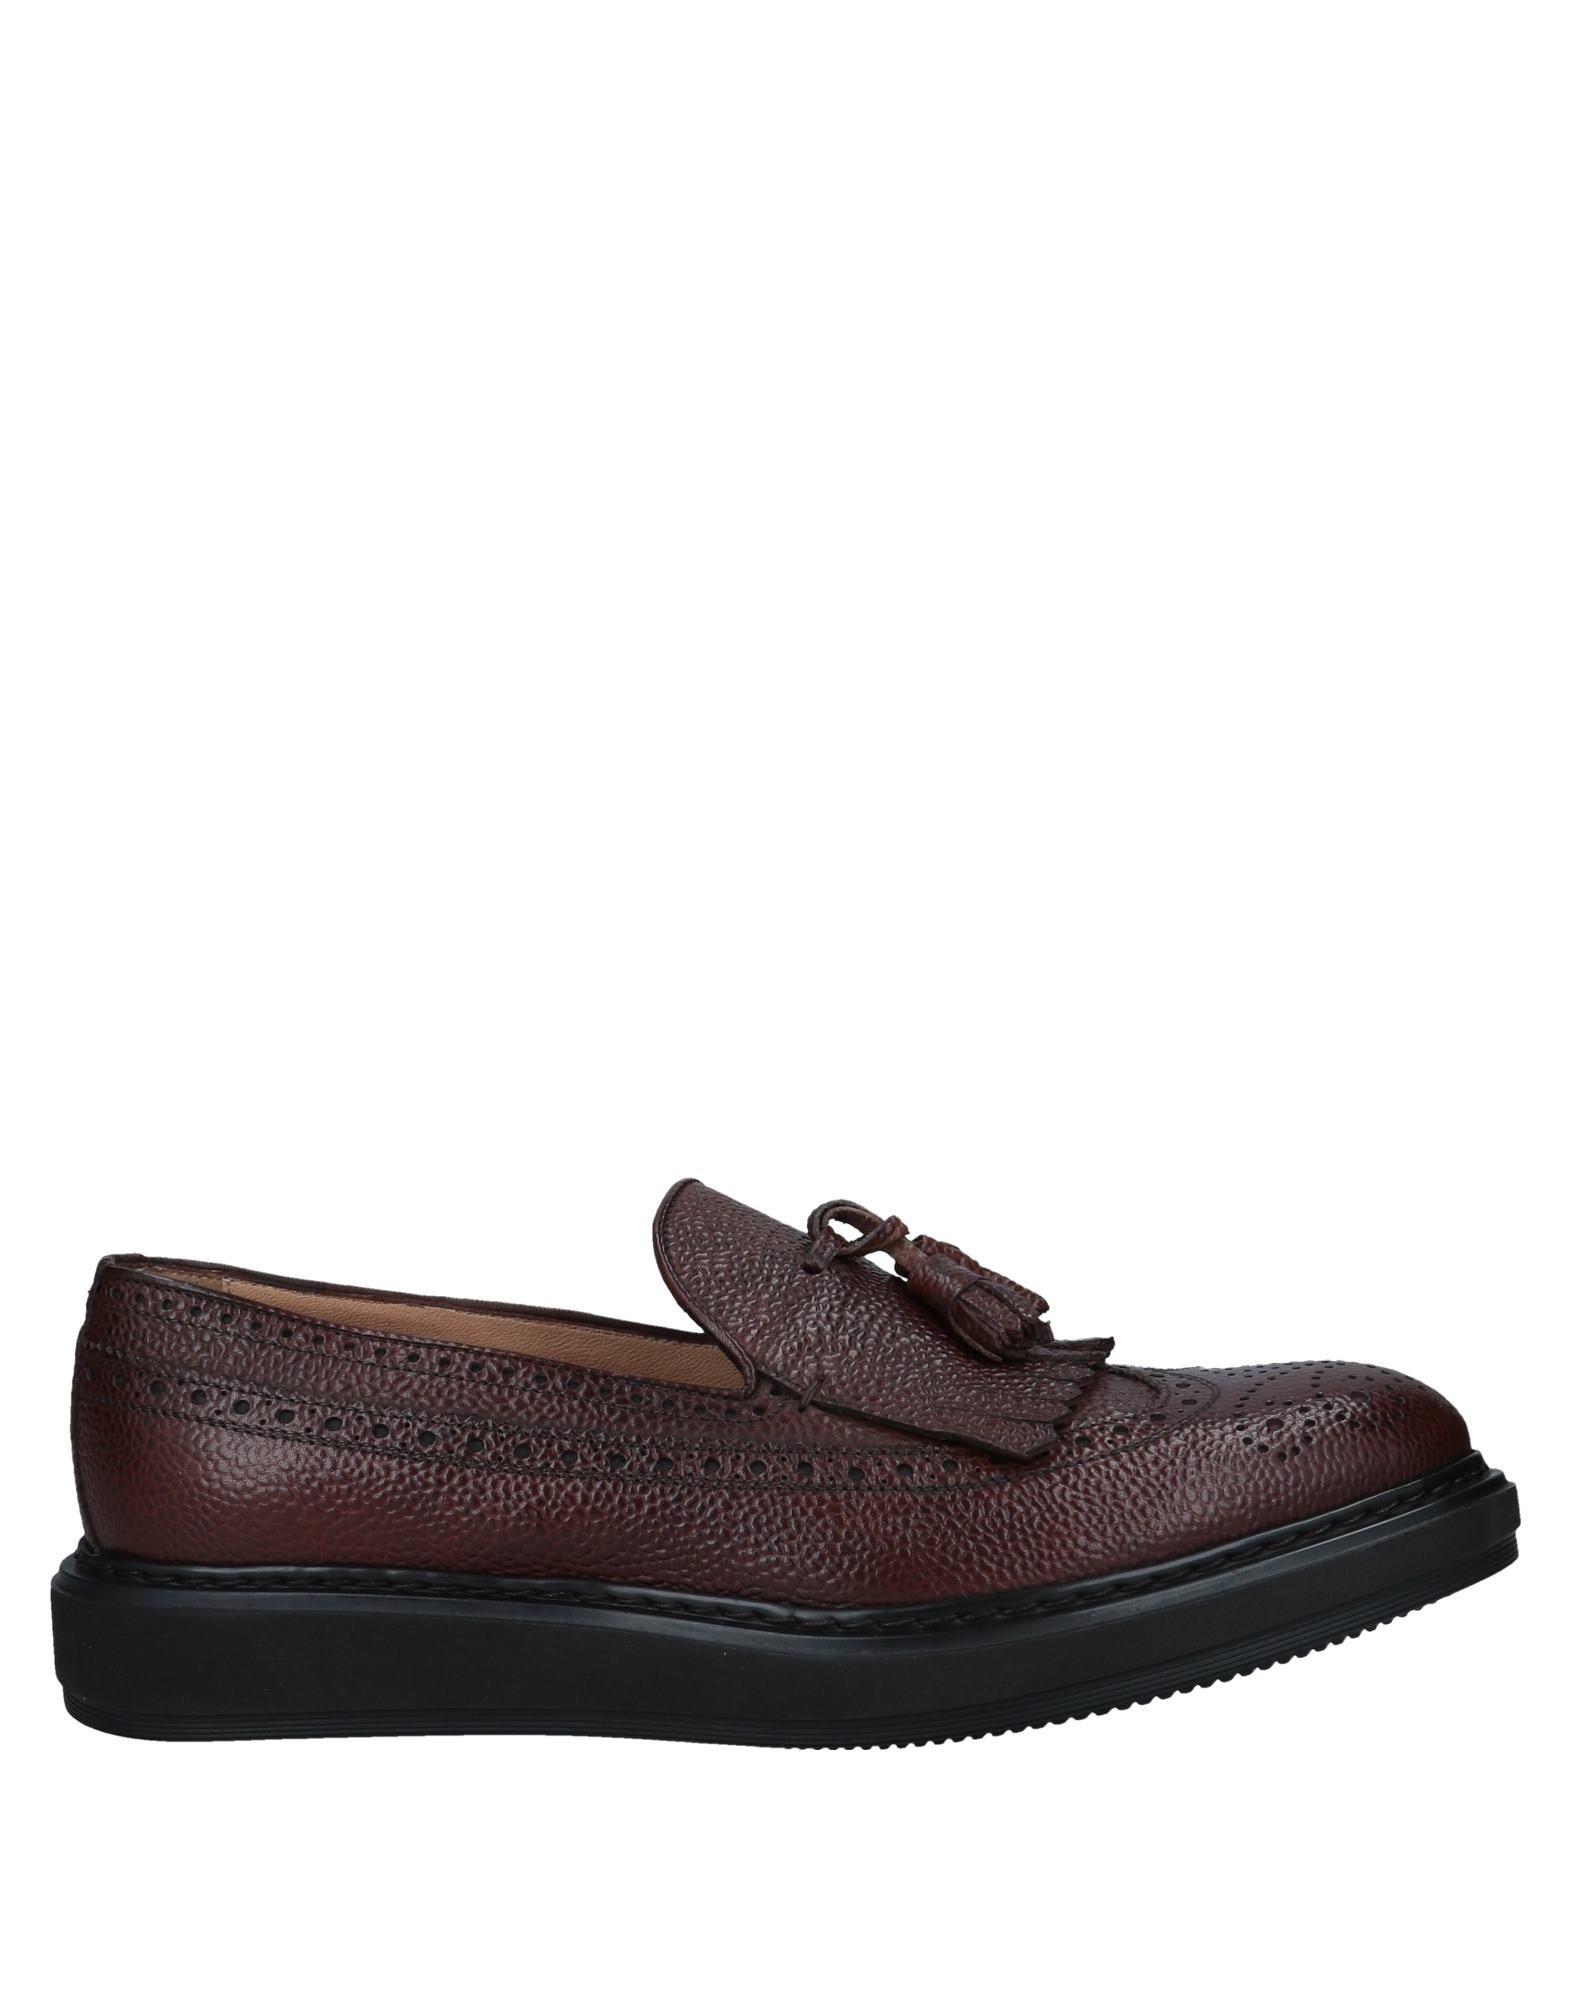 Baldinini Mokassins Herren  Schuhe 11554285TL Gute Qualität beliebte Schuhe  567e11